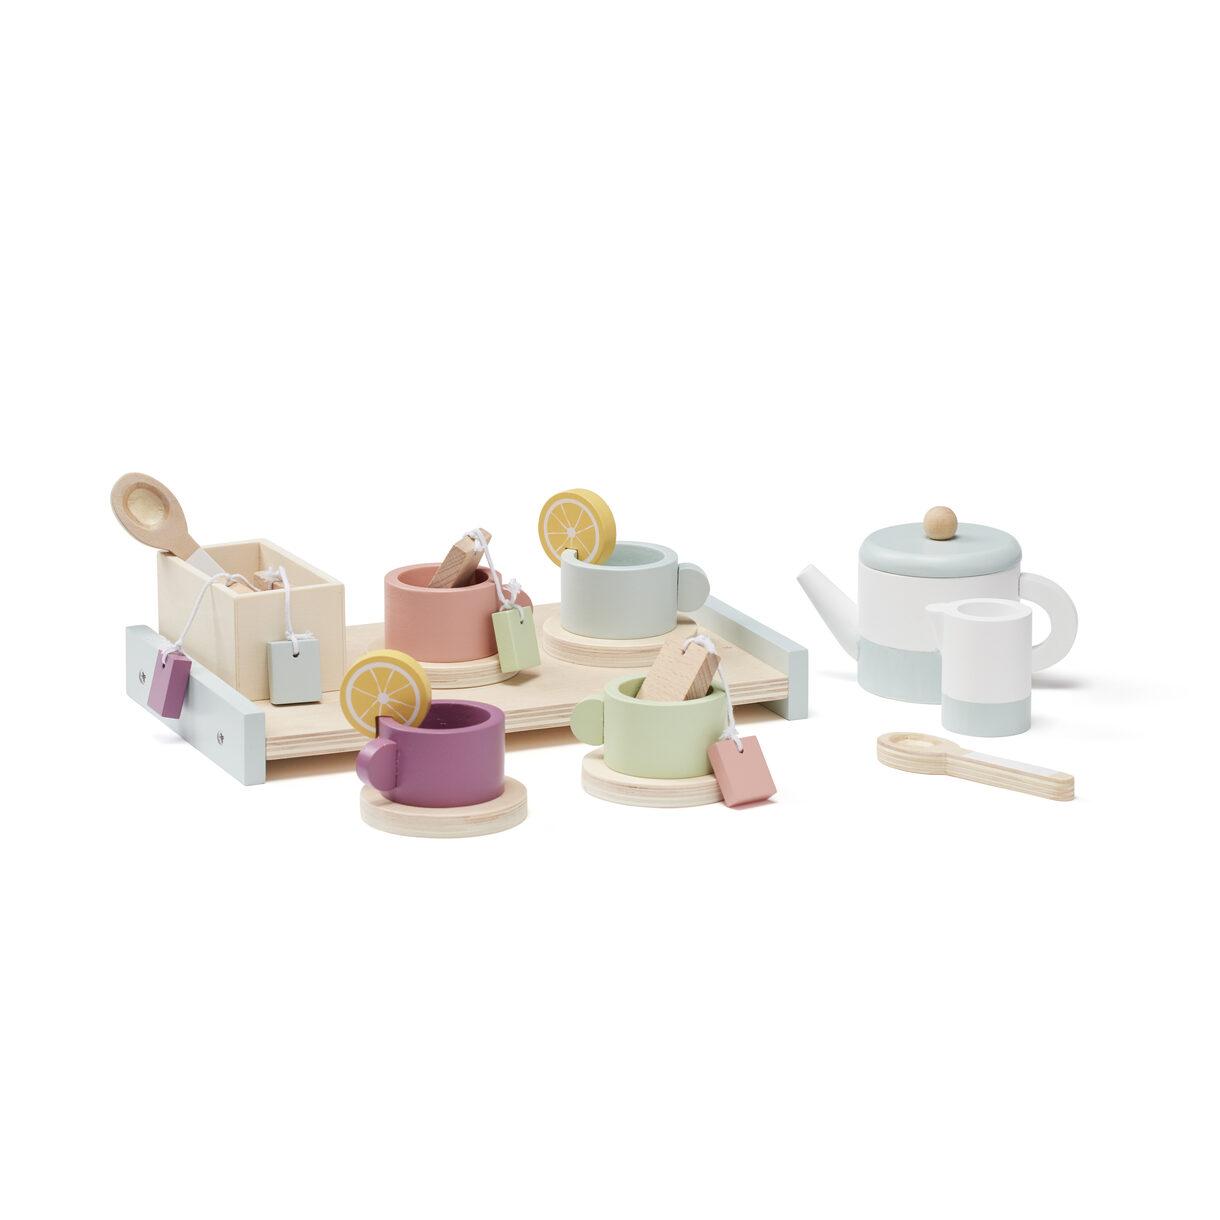 Kids Concept - Tea set - BISTRO (1000455)